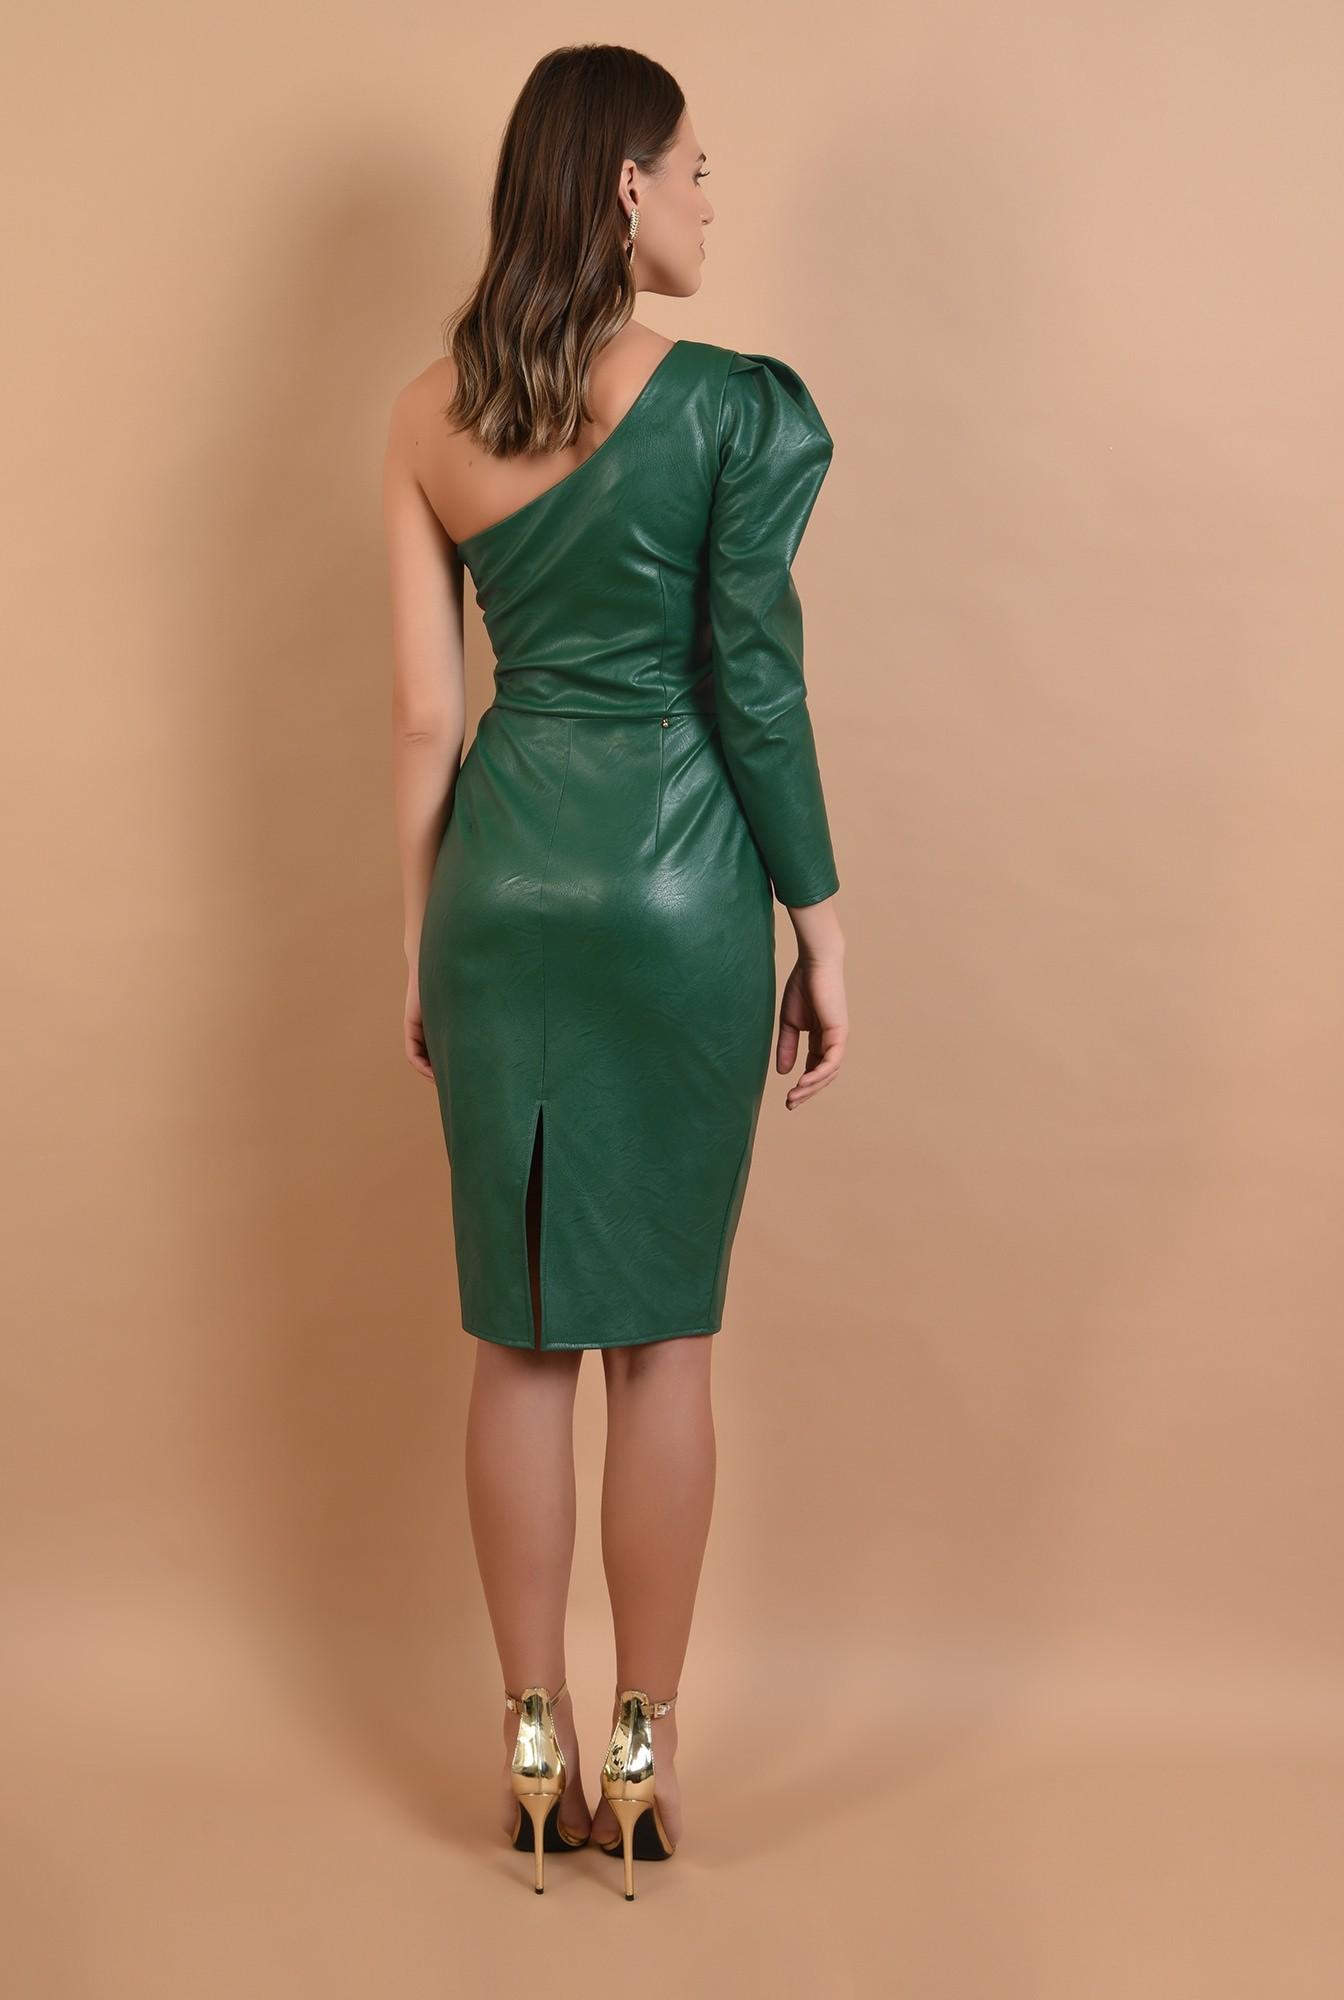 1 - 360 - rochie midi, conica, umar gol, piele ecologica